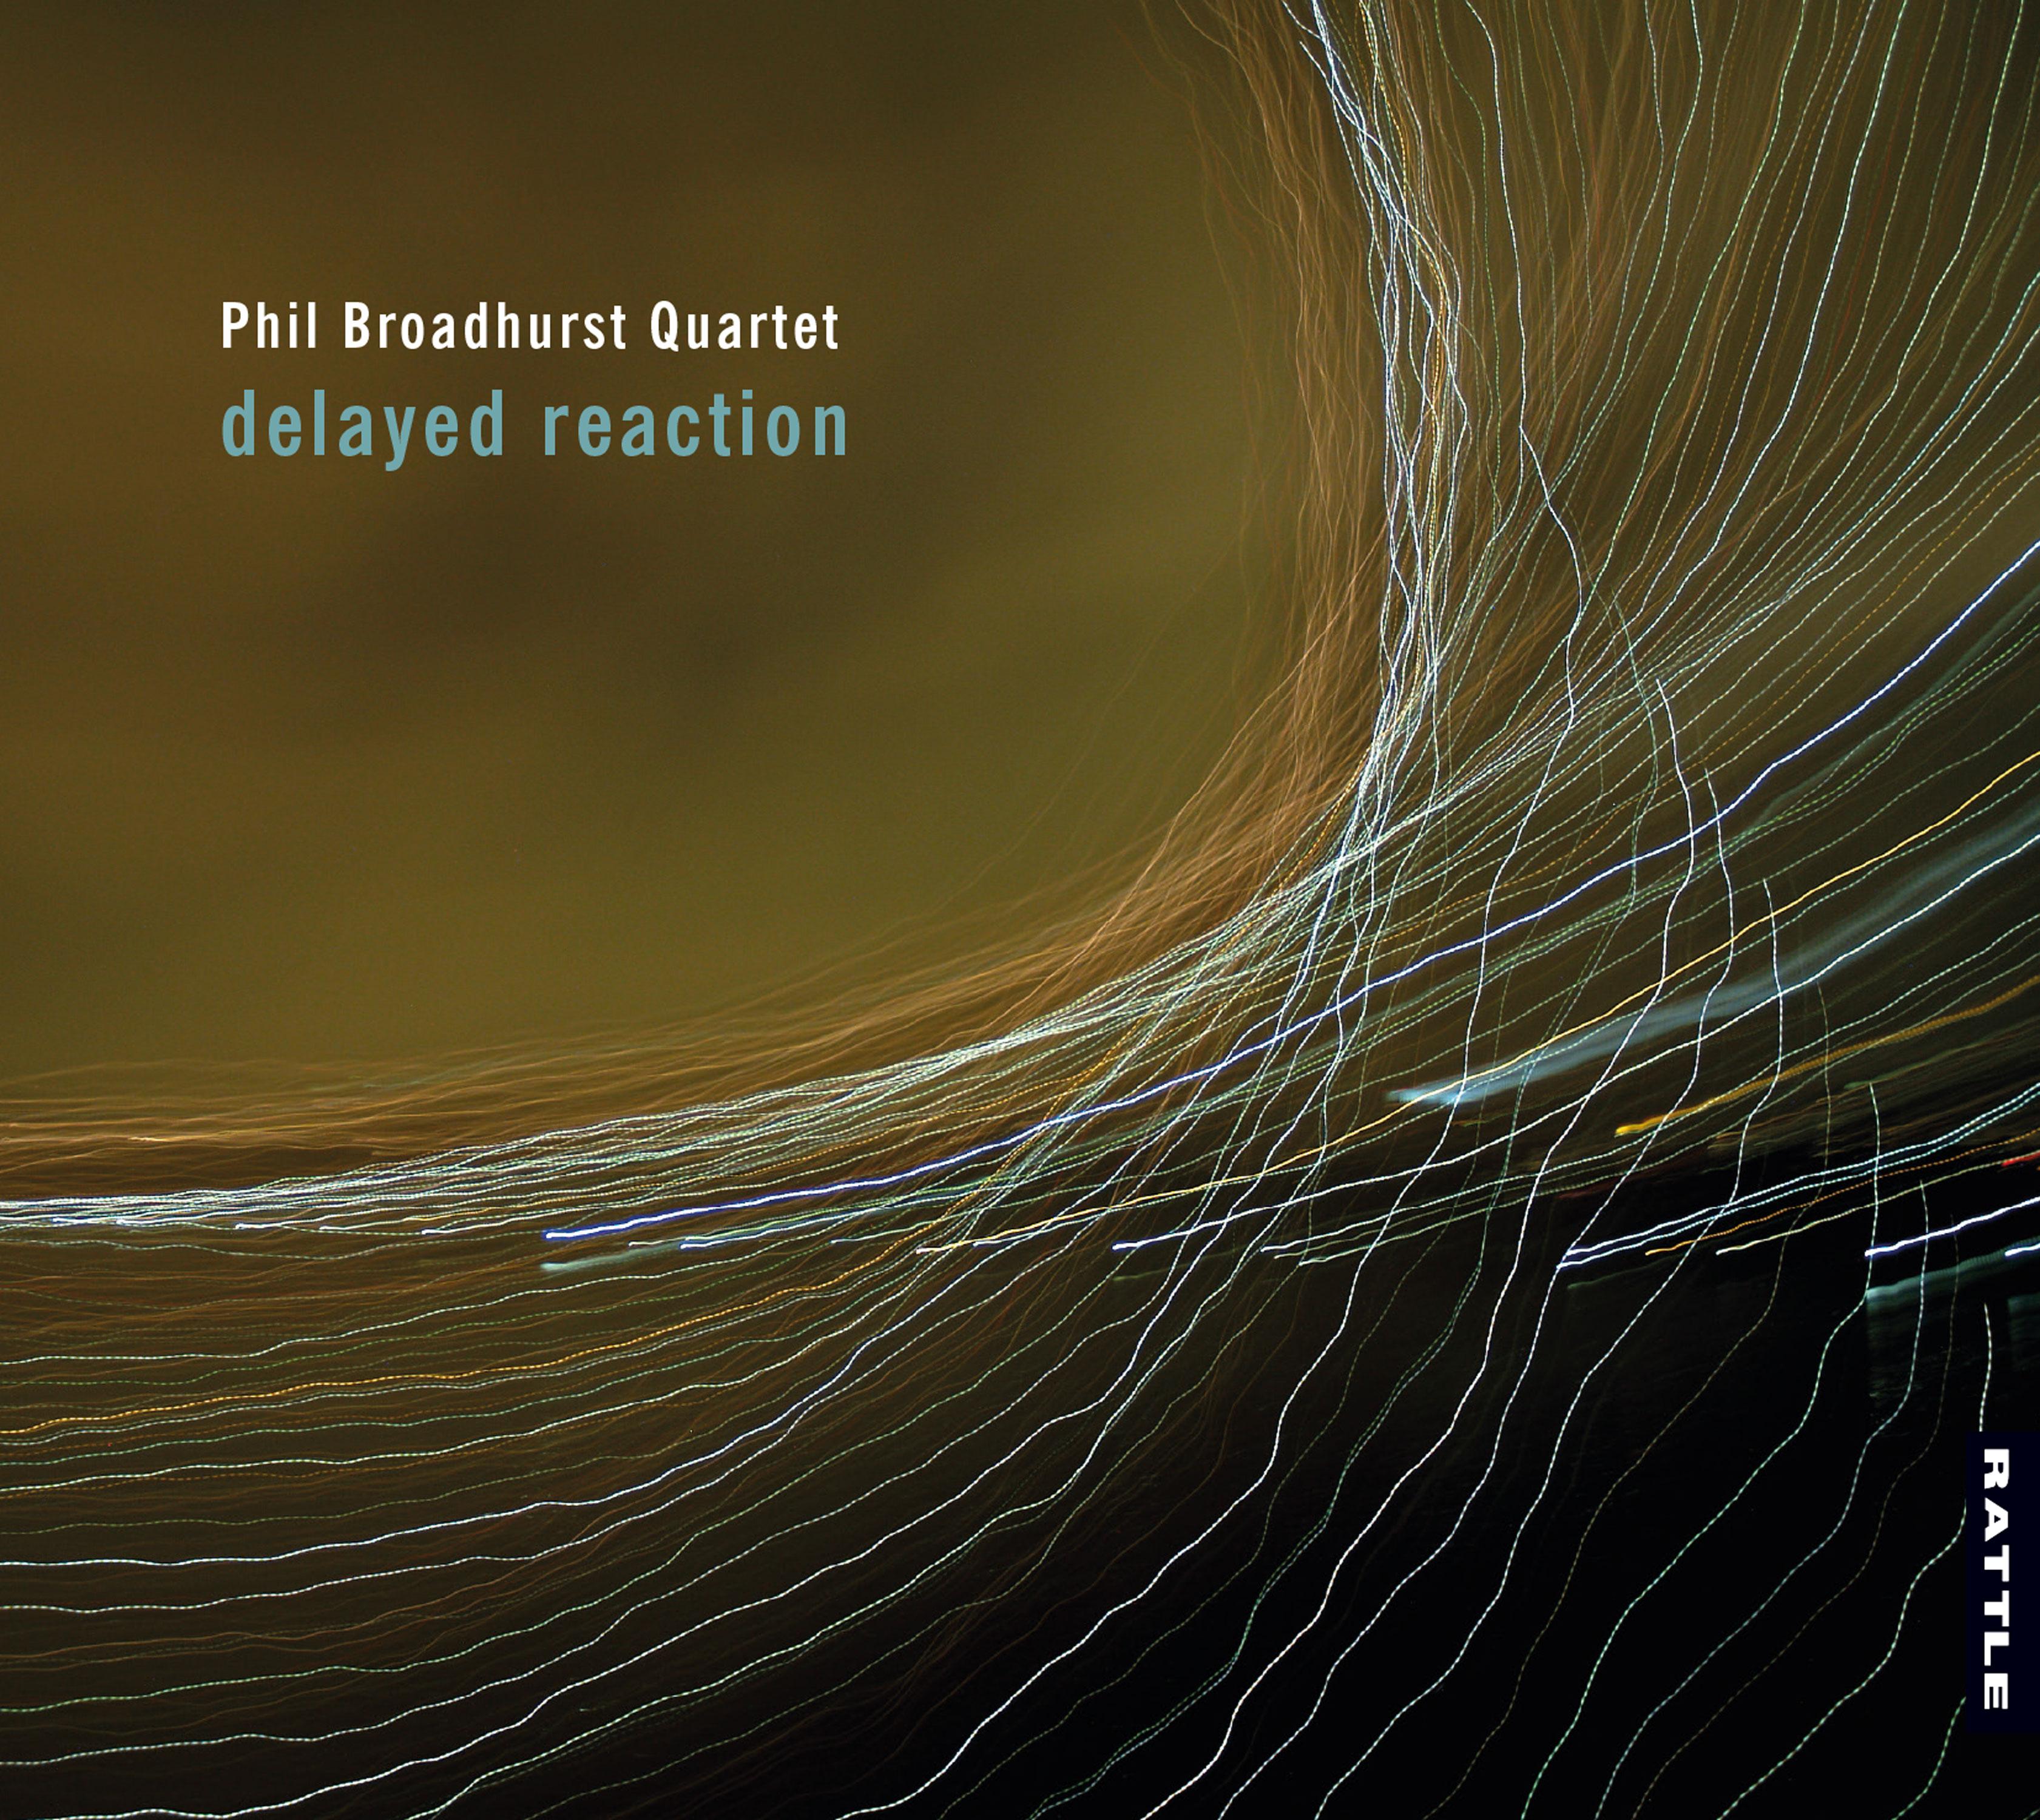 Phil Broadhurst | Delayed Reaction - downloadable MP3 ALBUM